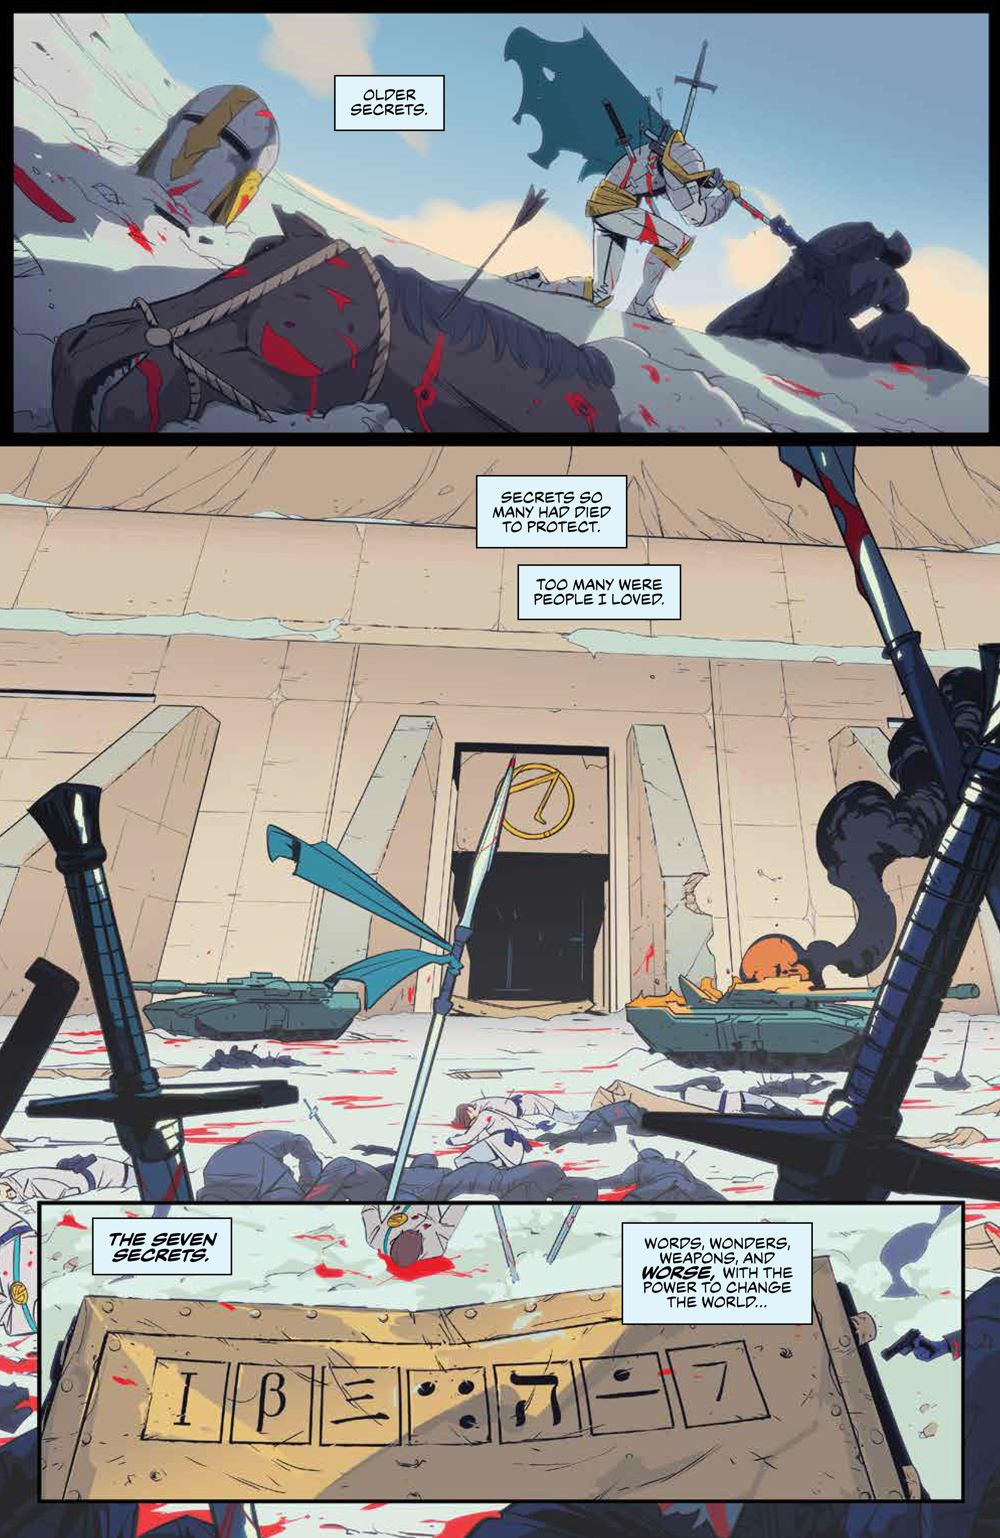 SevenSecrets_v1_SC_PRESS_8 ComicList Previews: SEVEN SECRETS VOLUME 1 TP